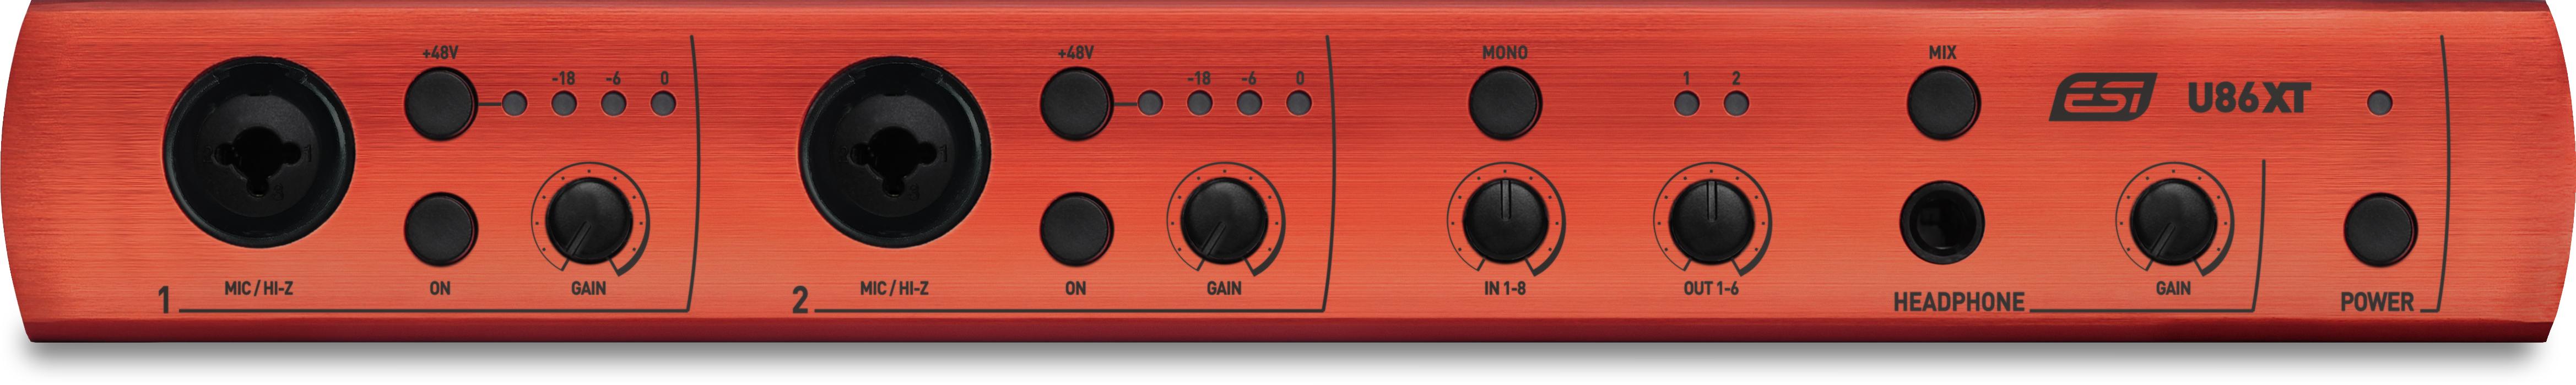 ESI U86 XT USB Audio Interface